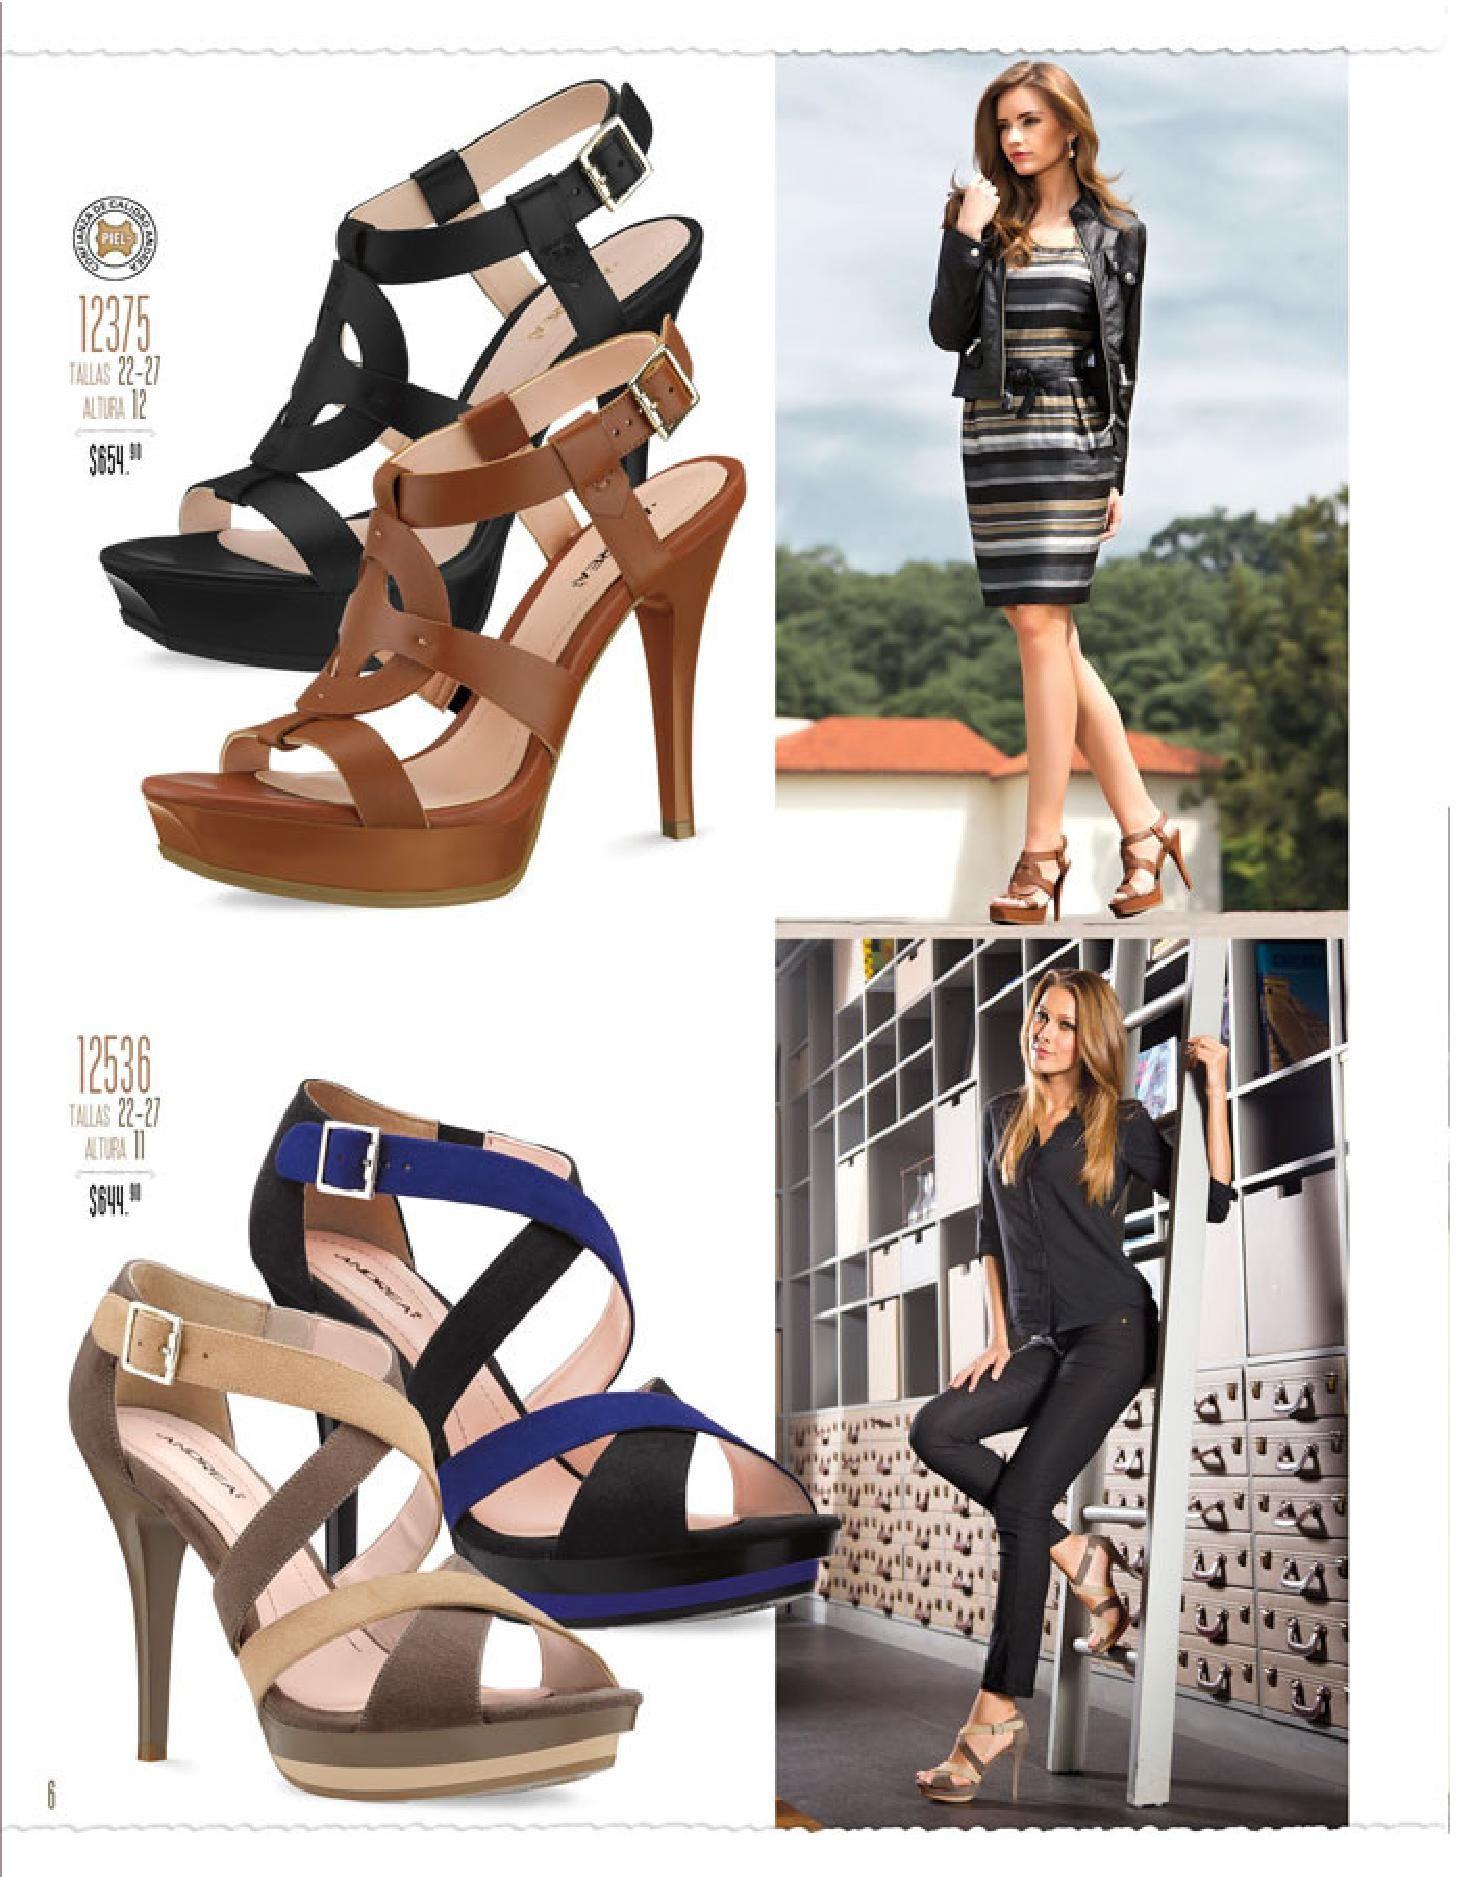 Sandalias Trend Moda Ropa Andrea Catalogo Fashion Monterrey Fashion Sandals Shoes